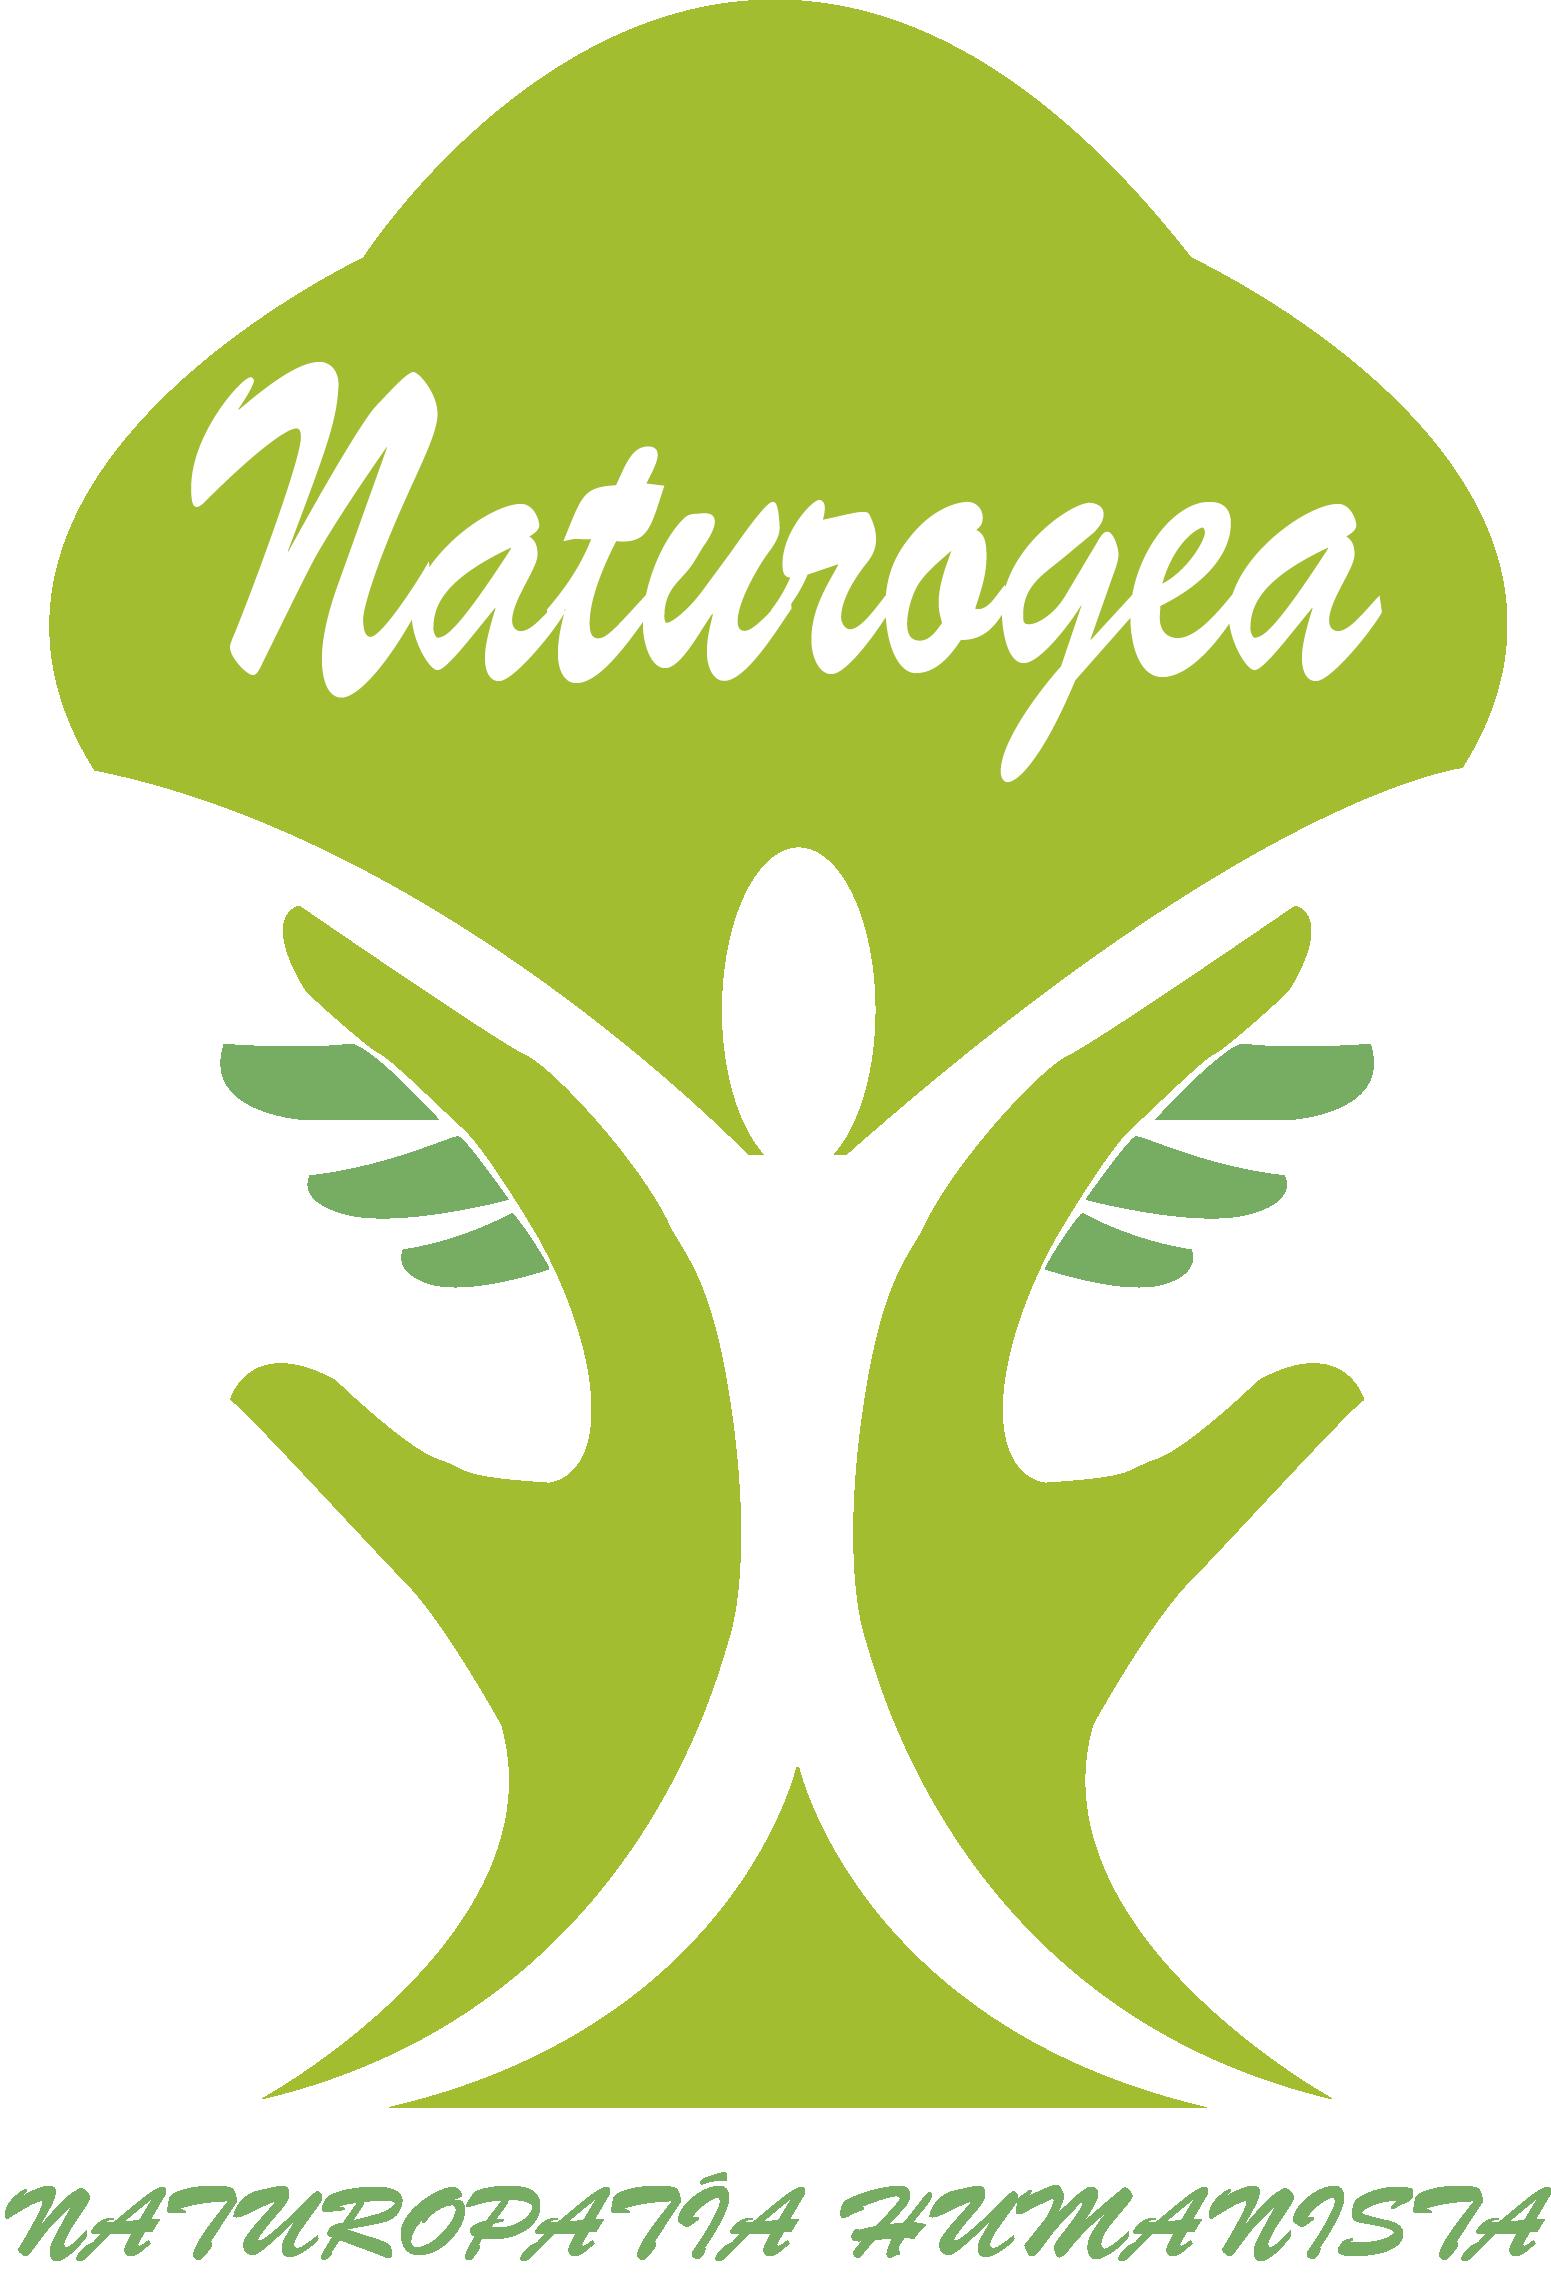 Naturogea